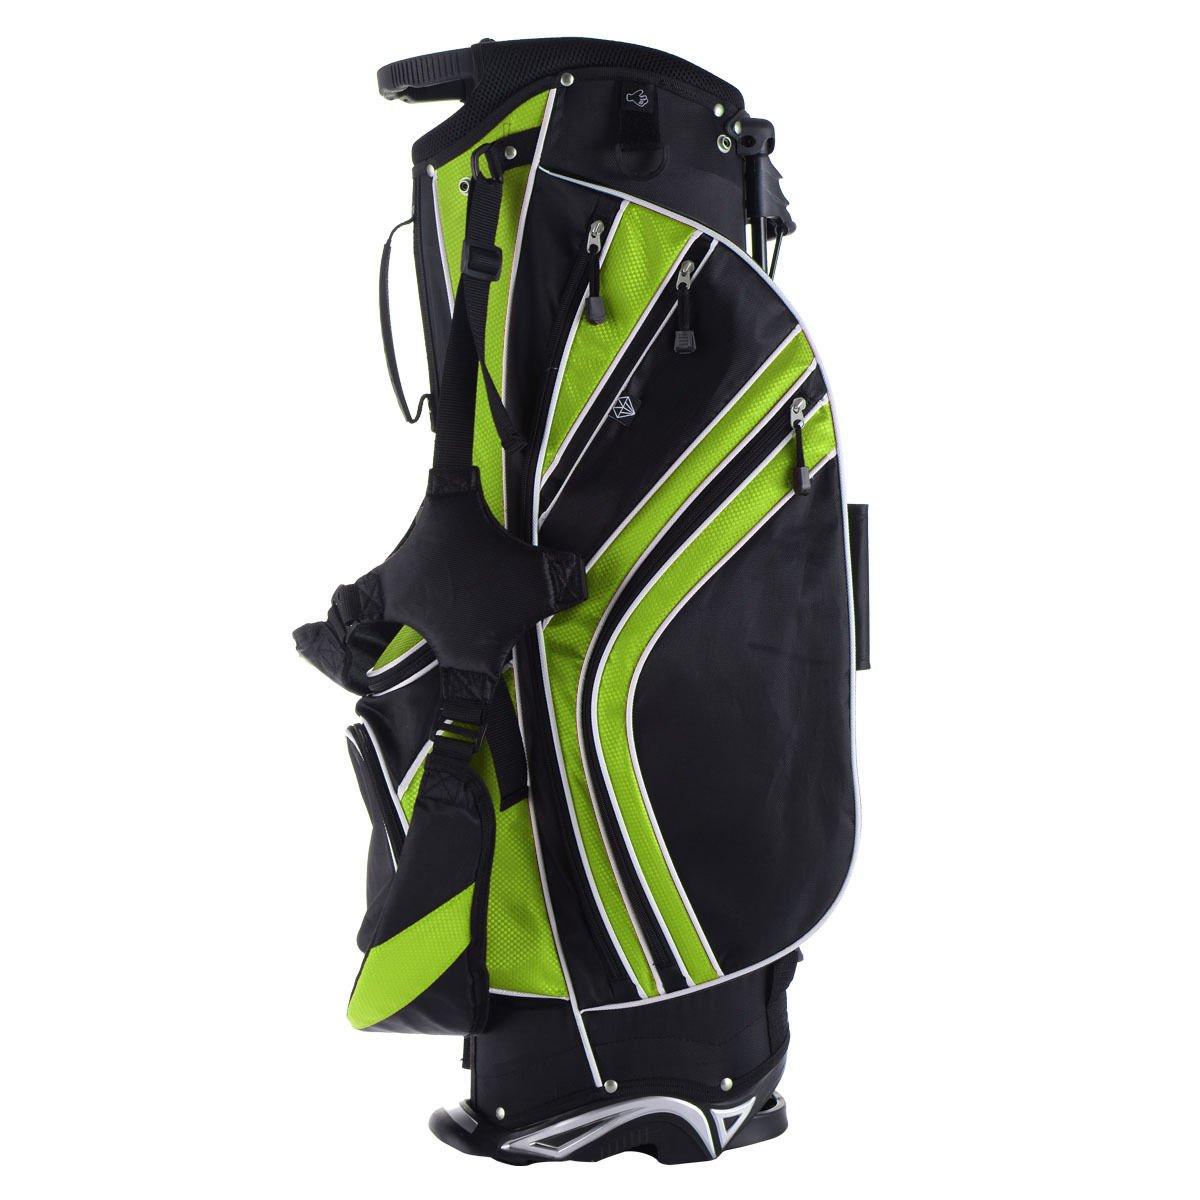 Green 6 Way Divider Golf Stand Bag Carry Organizer